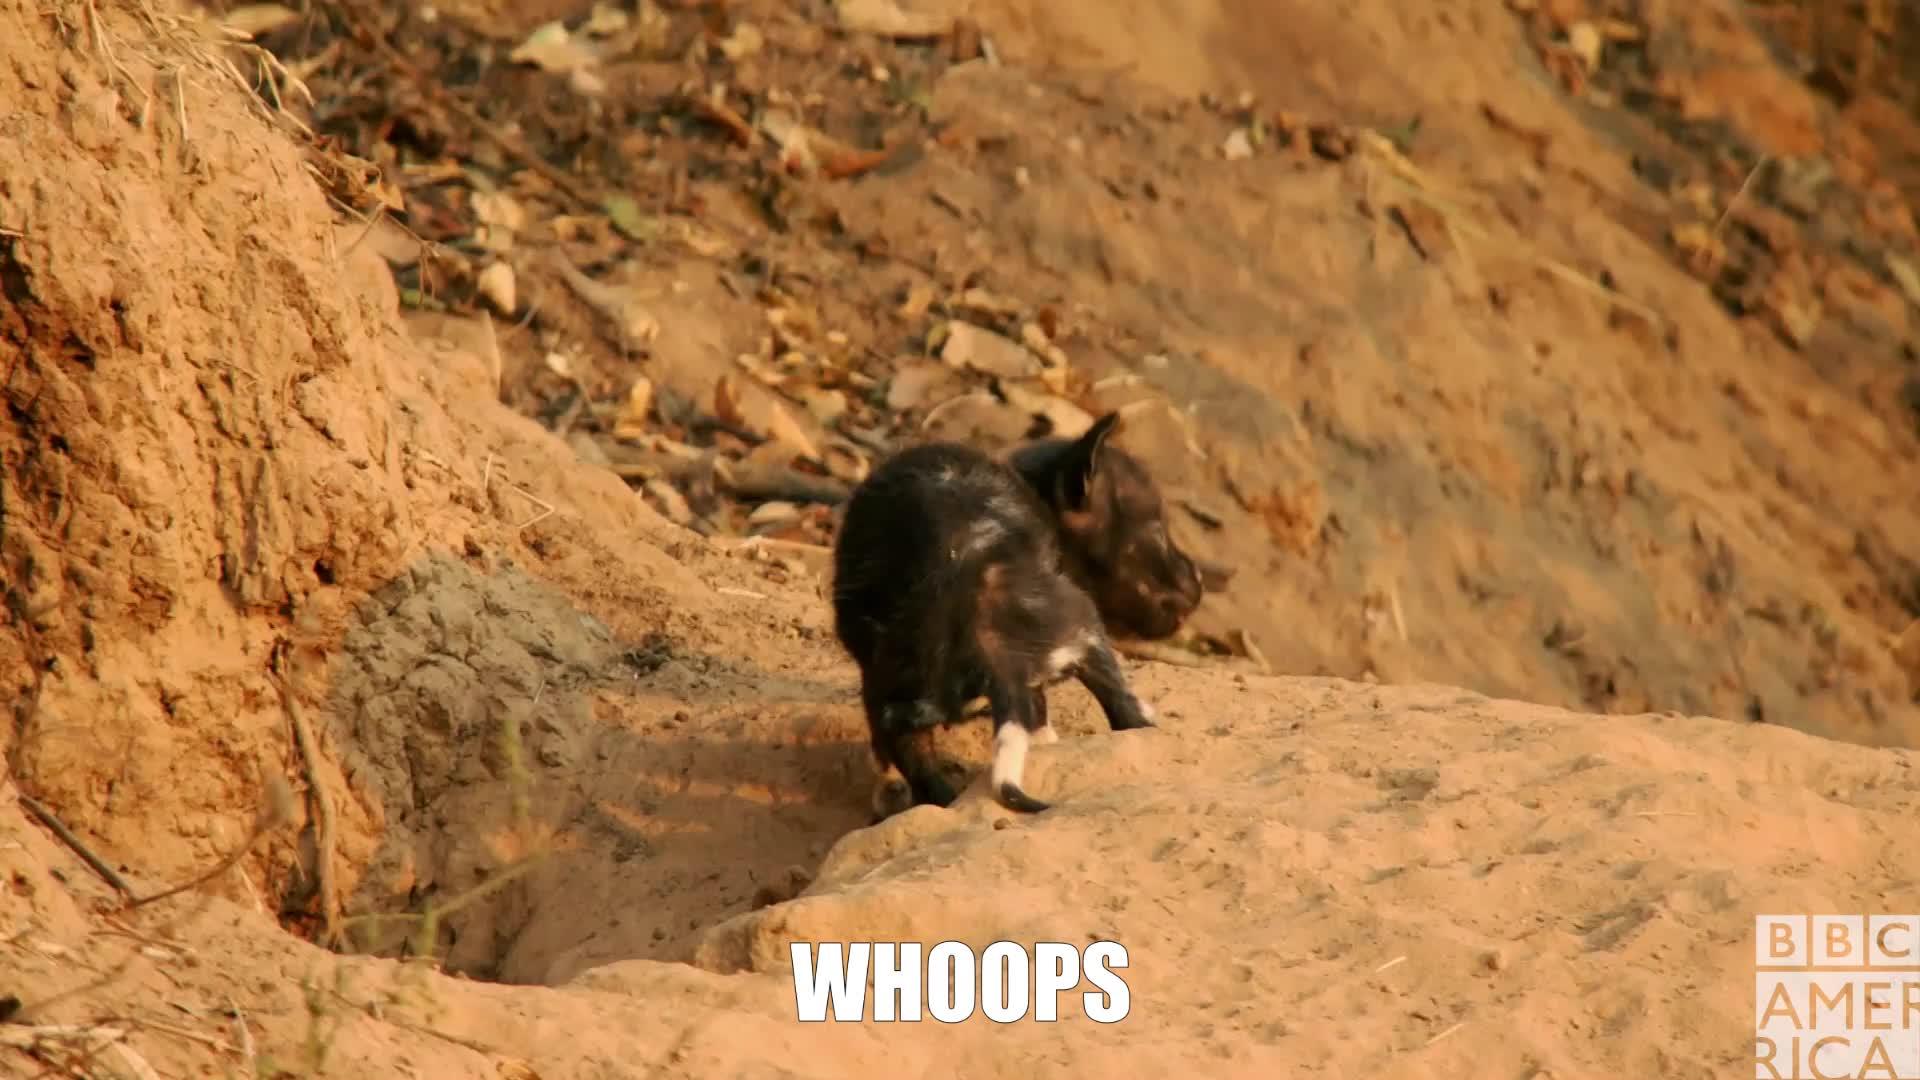 animal, animals, bbc america, bbc america dynasties, bbc america: dynasties, dynasties, fail, oops, painted wolf, painted wolves, whoops, wolf, wolves, Dynasties Whoops Wolf Pup GIFs